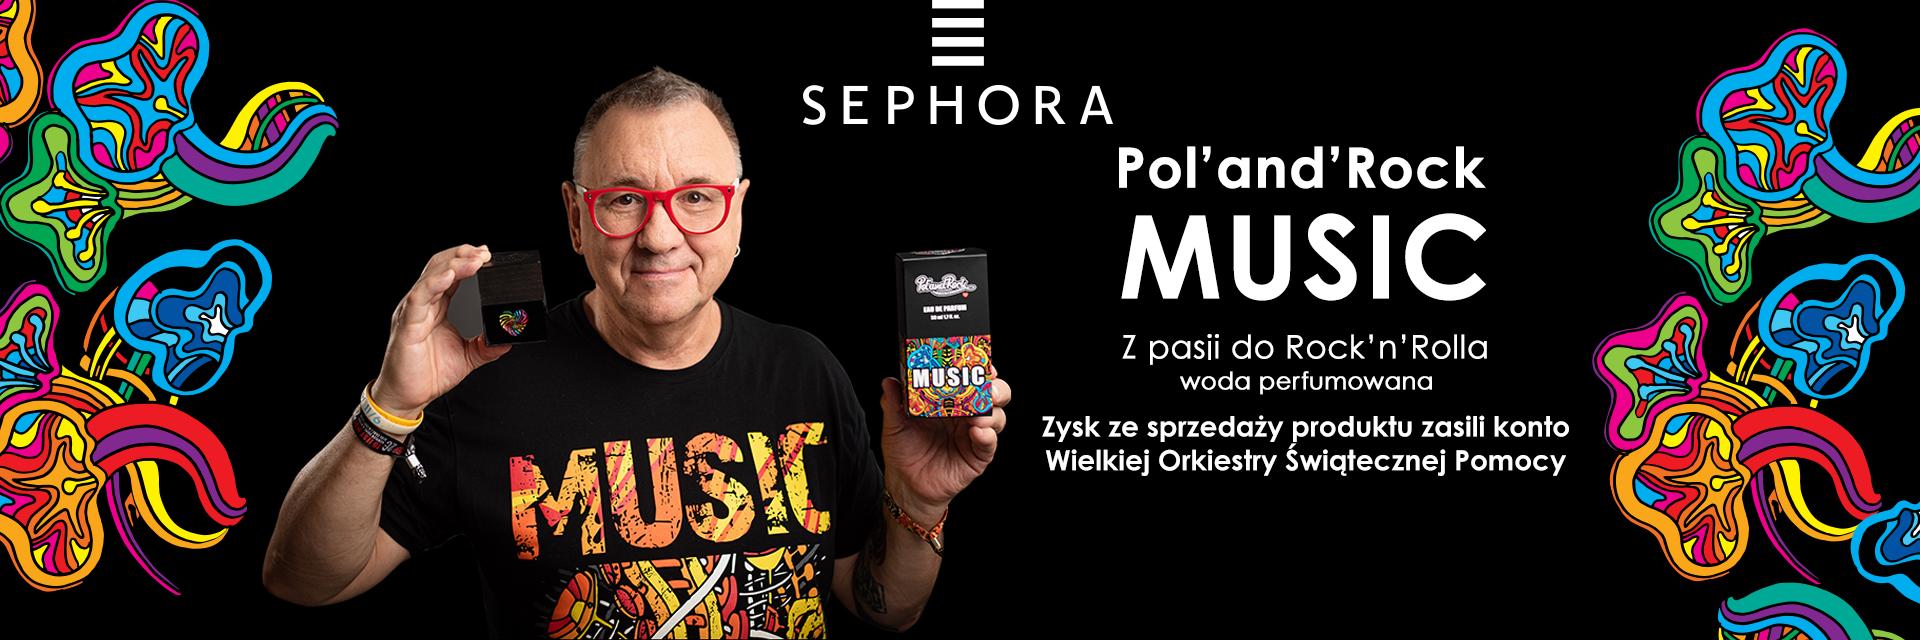 Sephora wyspa-kobiet.pl